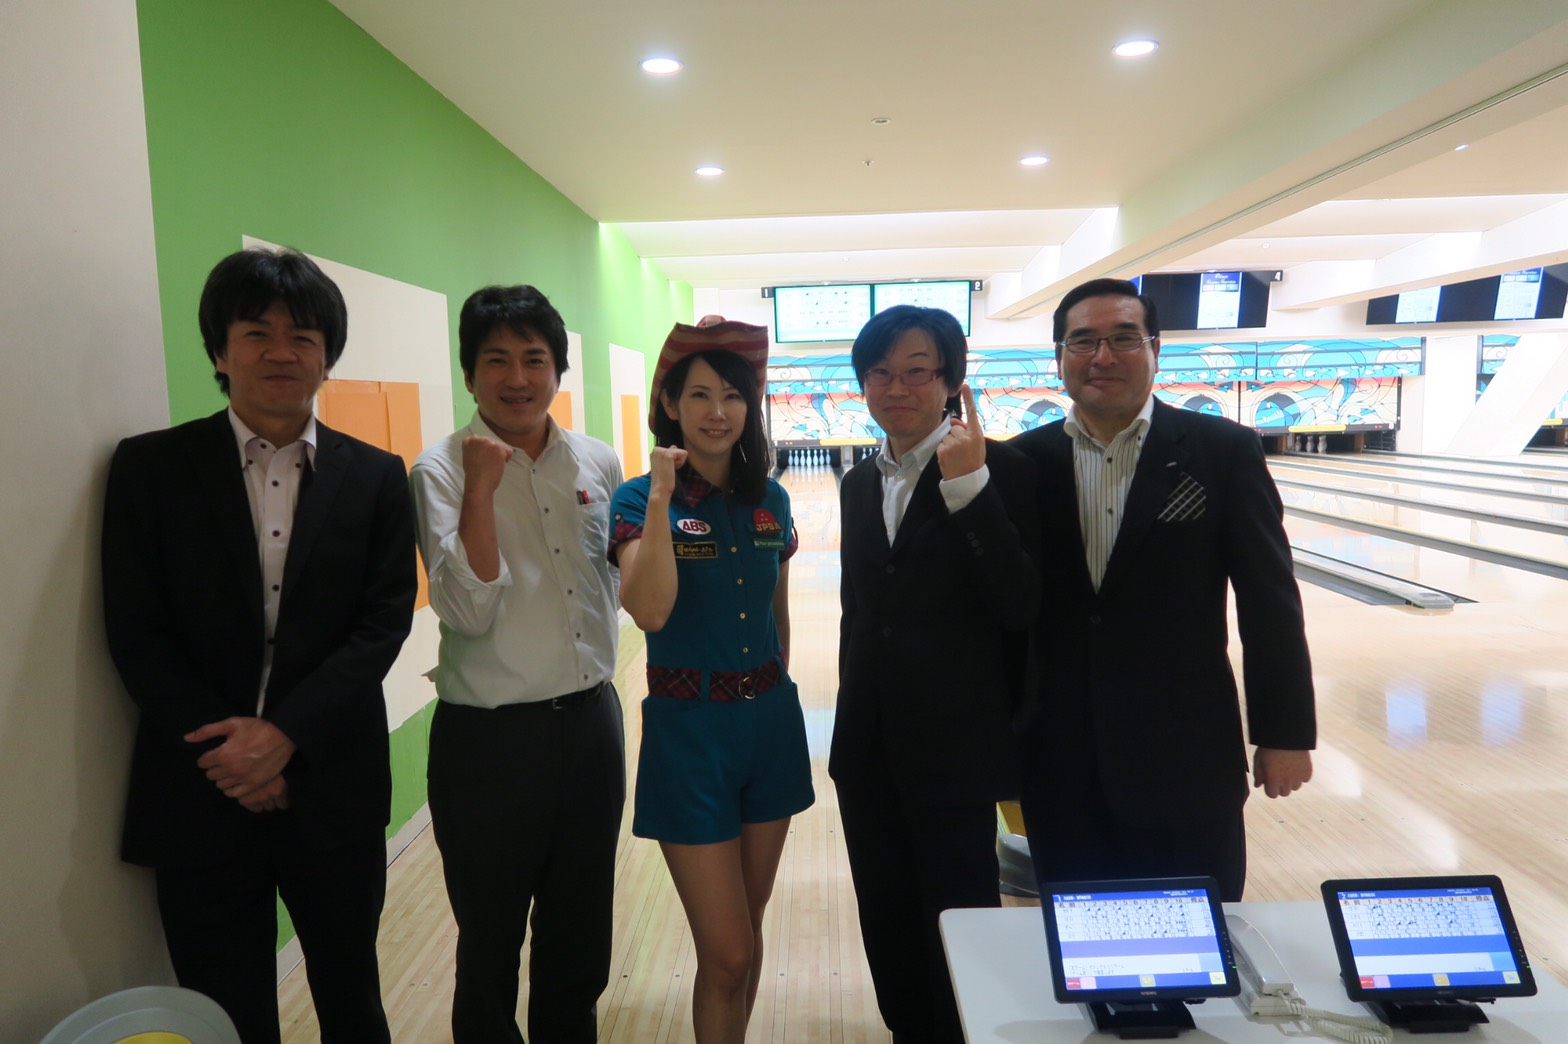 日本食品機械工業会様ボウリング大会☆_d0156990_1845175.jpg